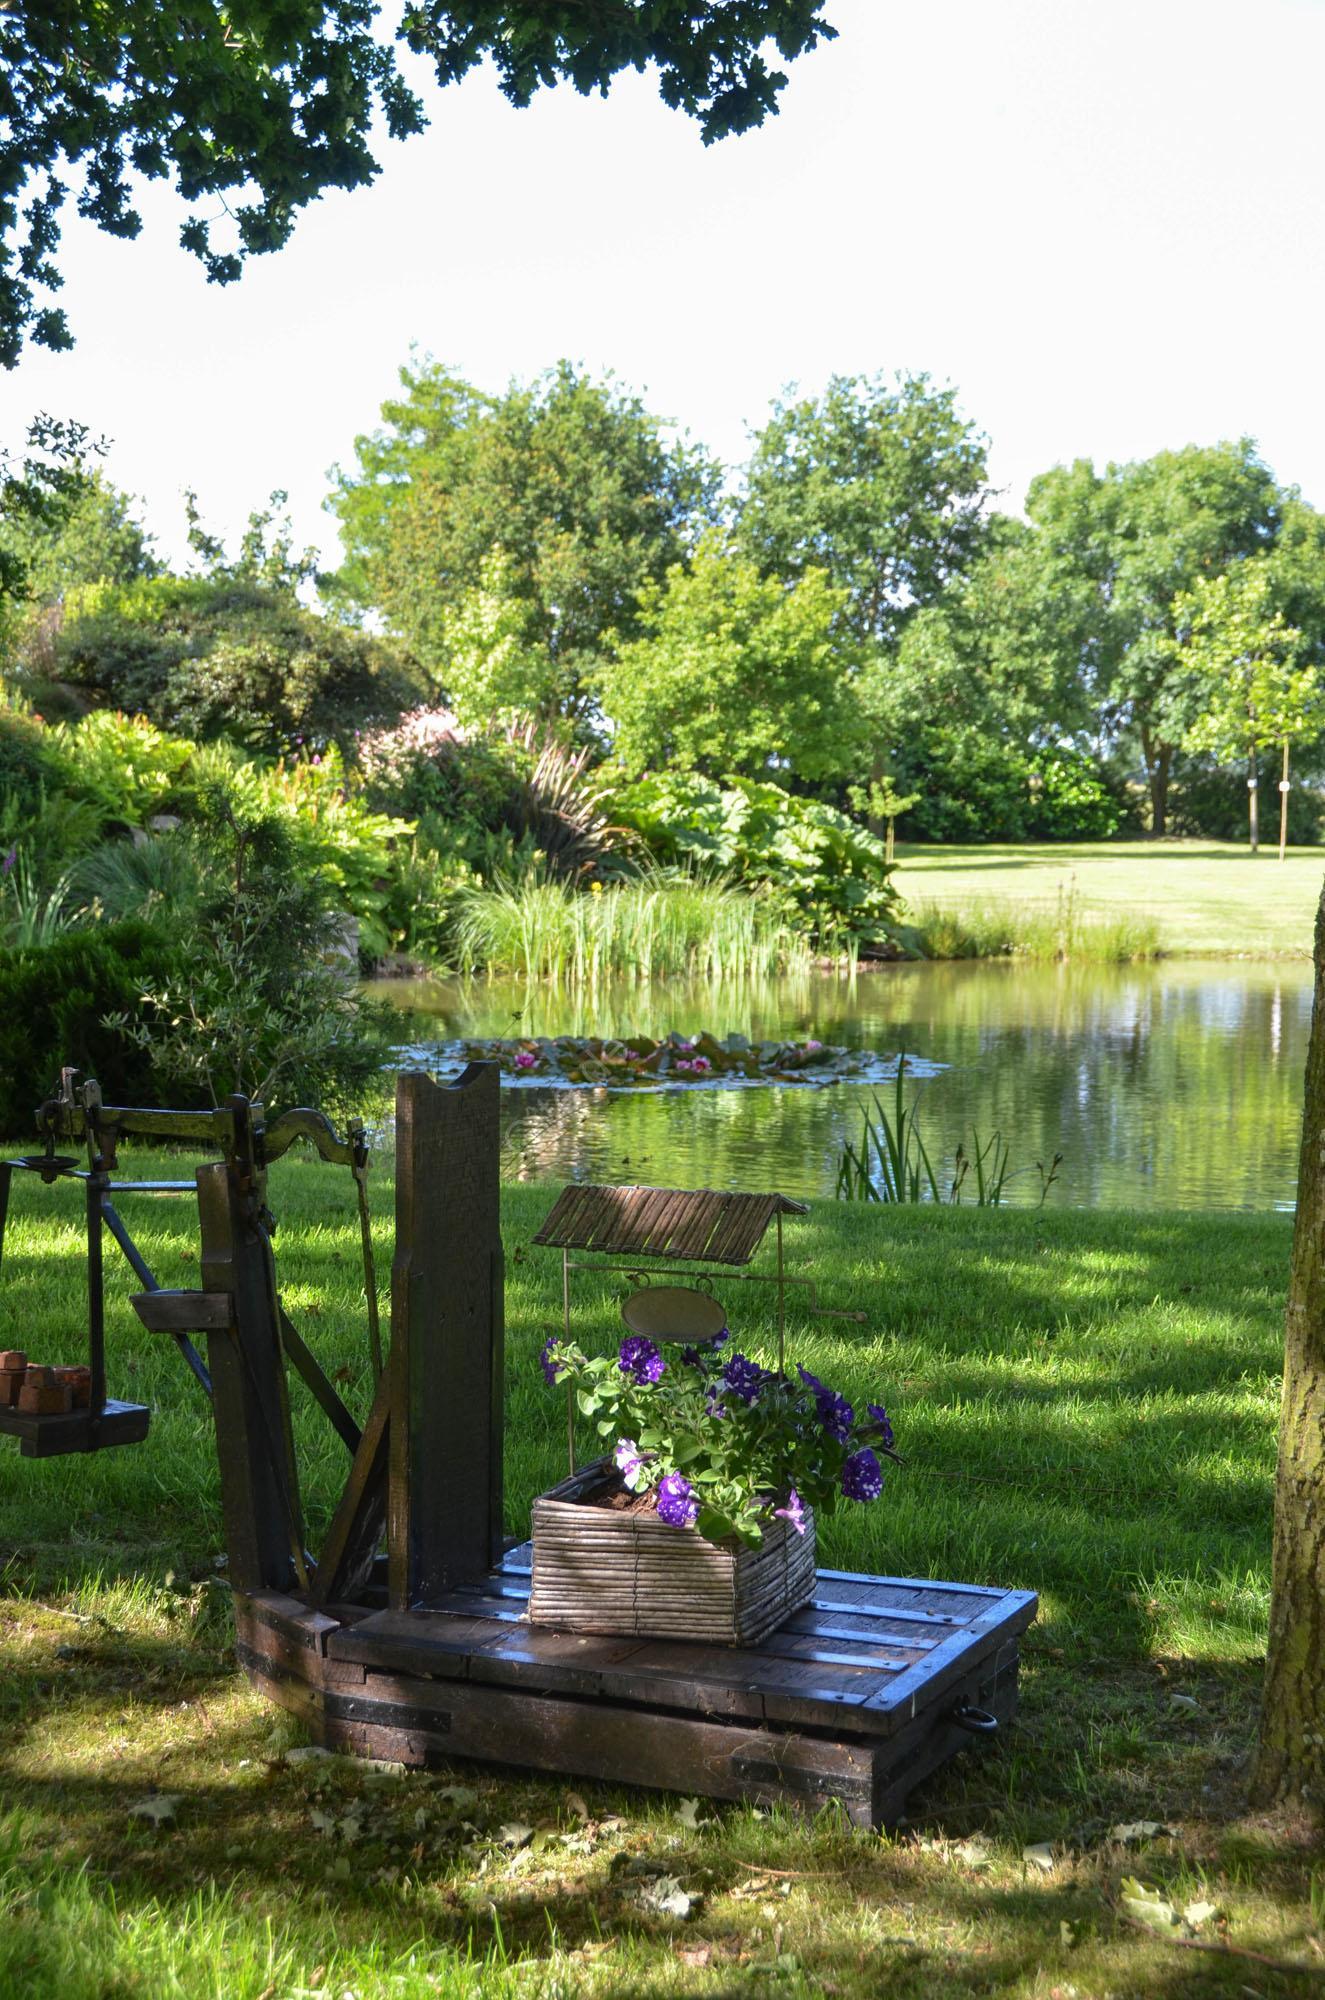 Bienvenue dans mon jardin 15 g te de la b zardais for Bienvenue dans mon jardin